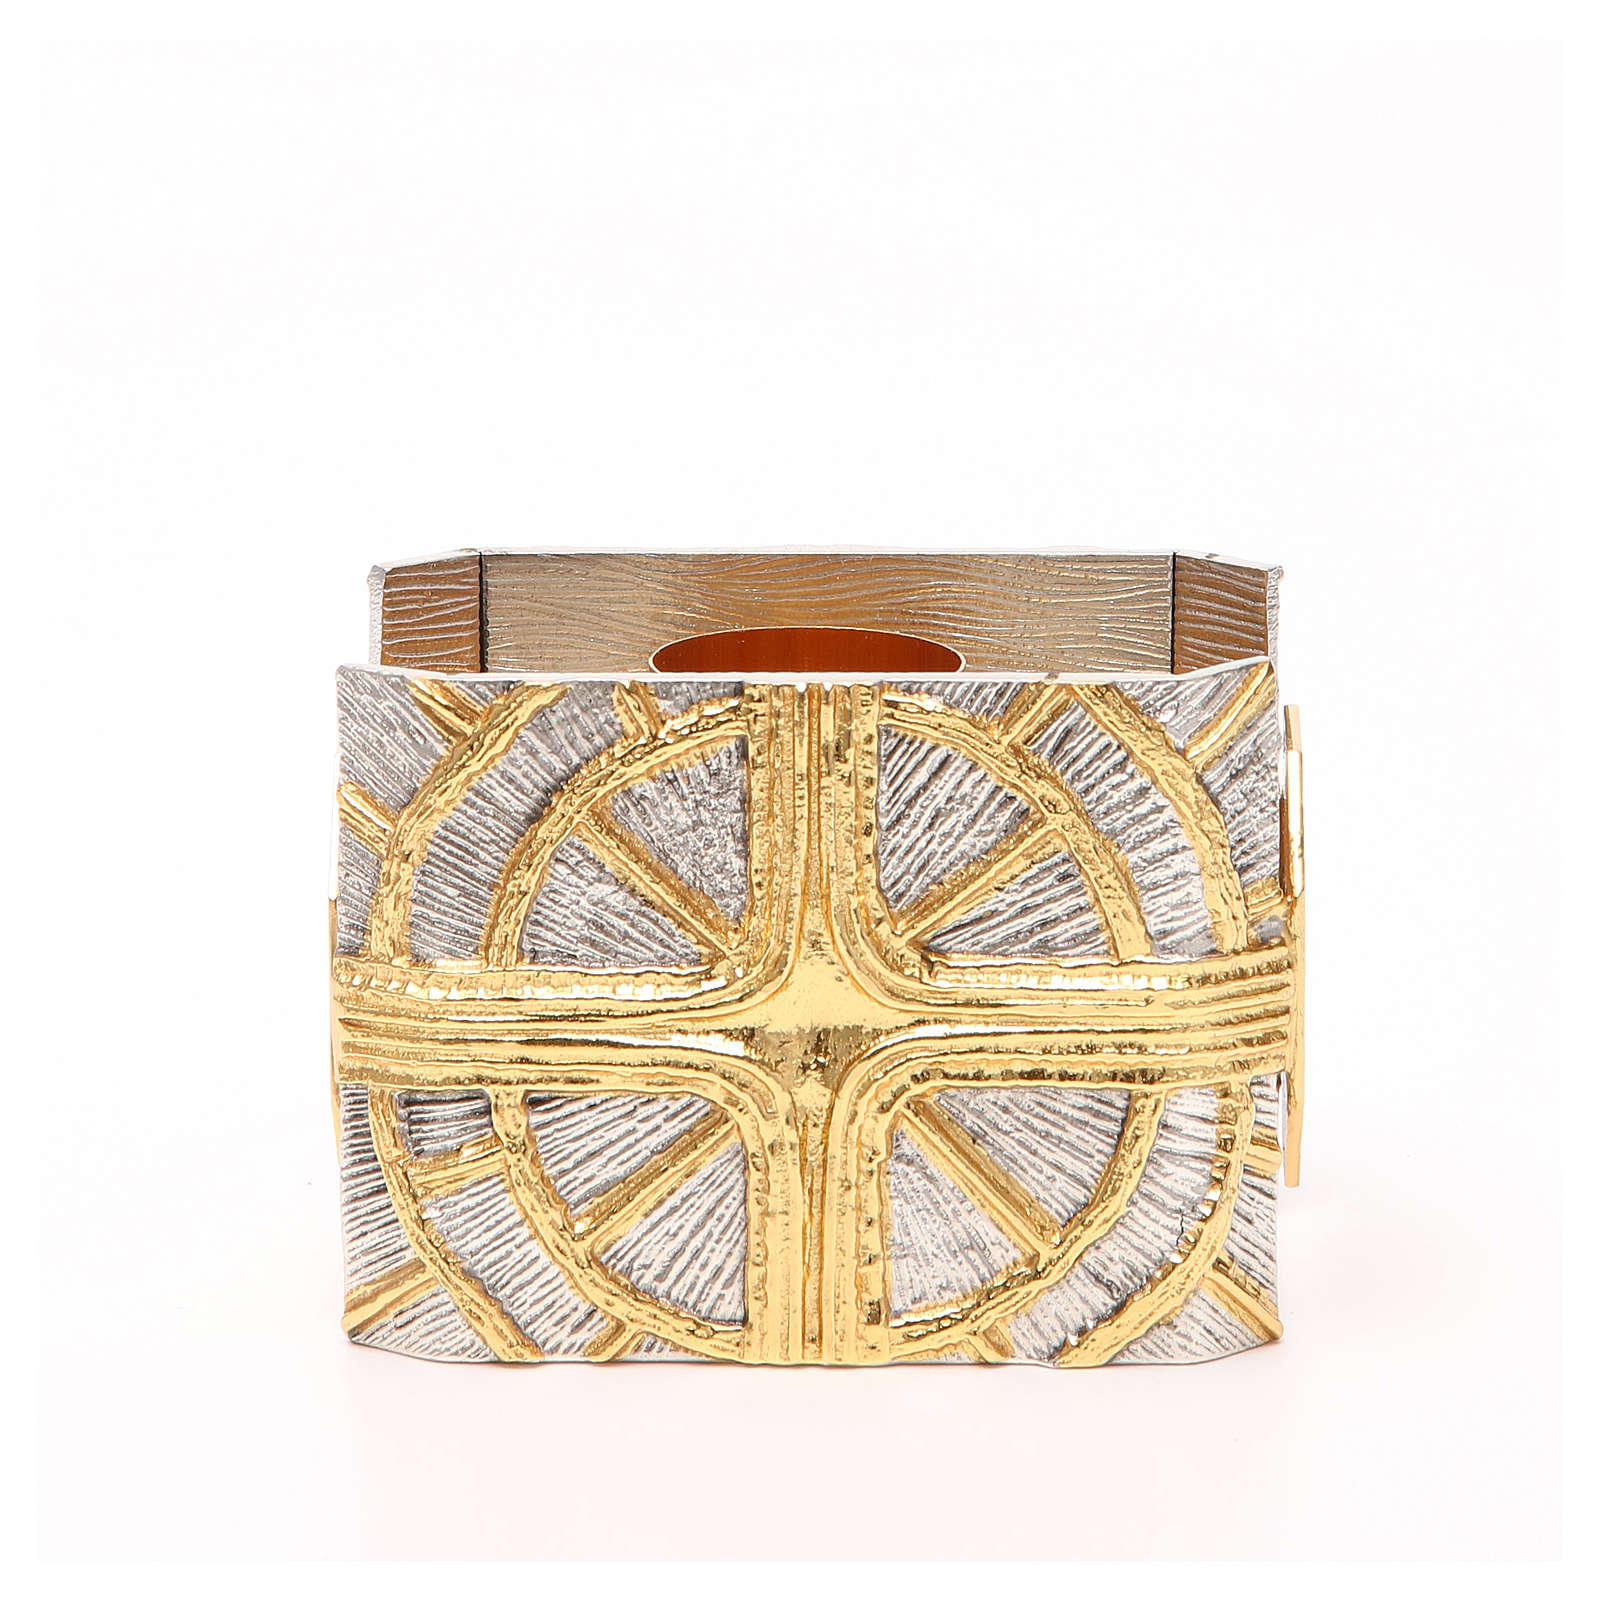 Portacandela bronzo dorato argentato croce raggi 4